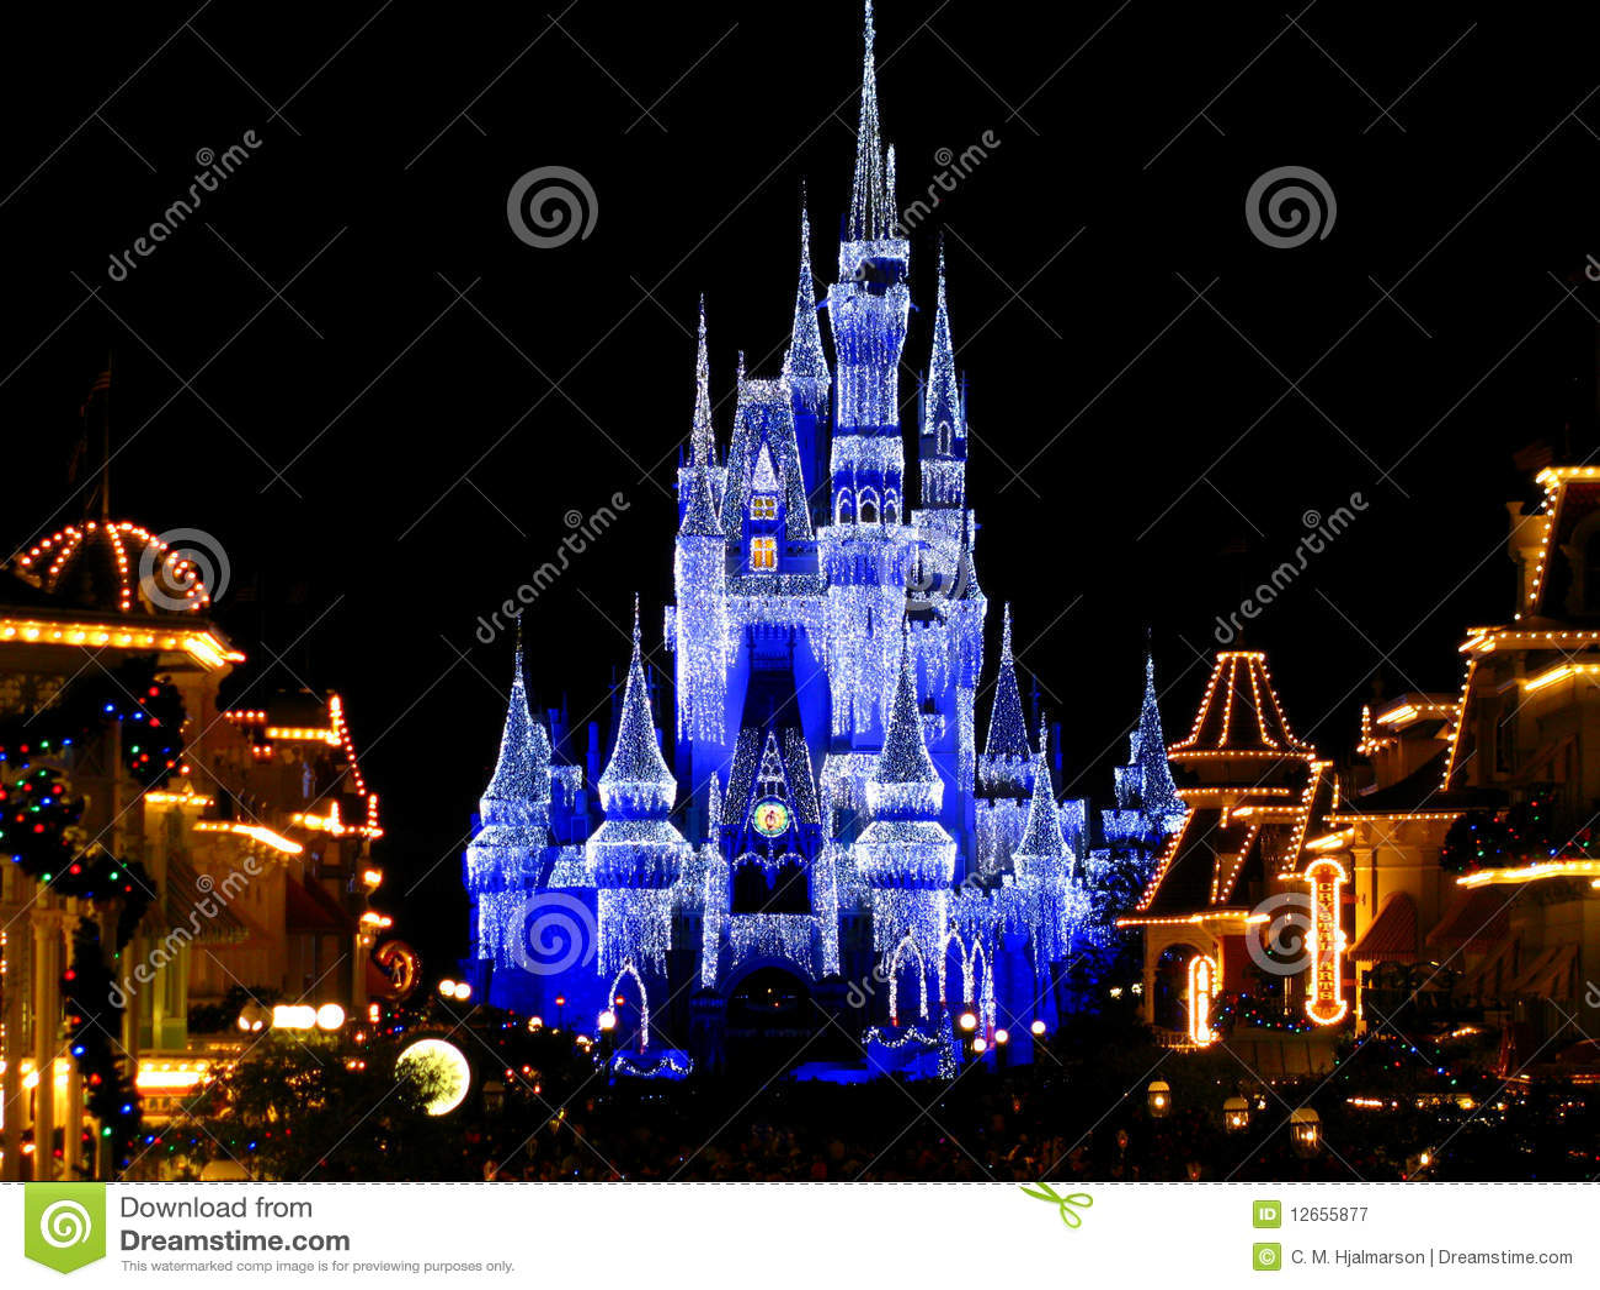 Disneyworld beleuchtet magisches Königreich-Schloss 1